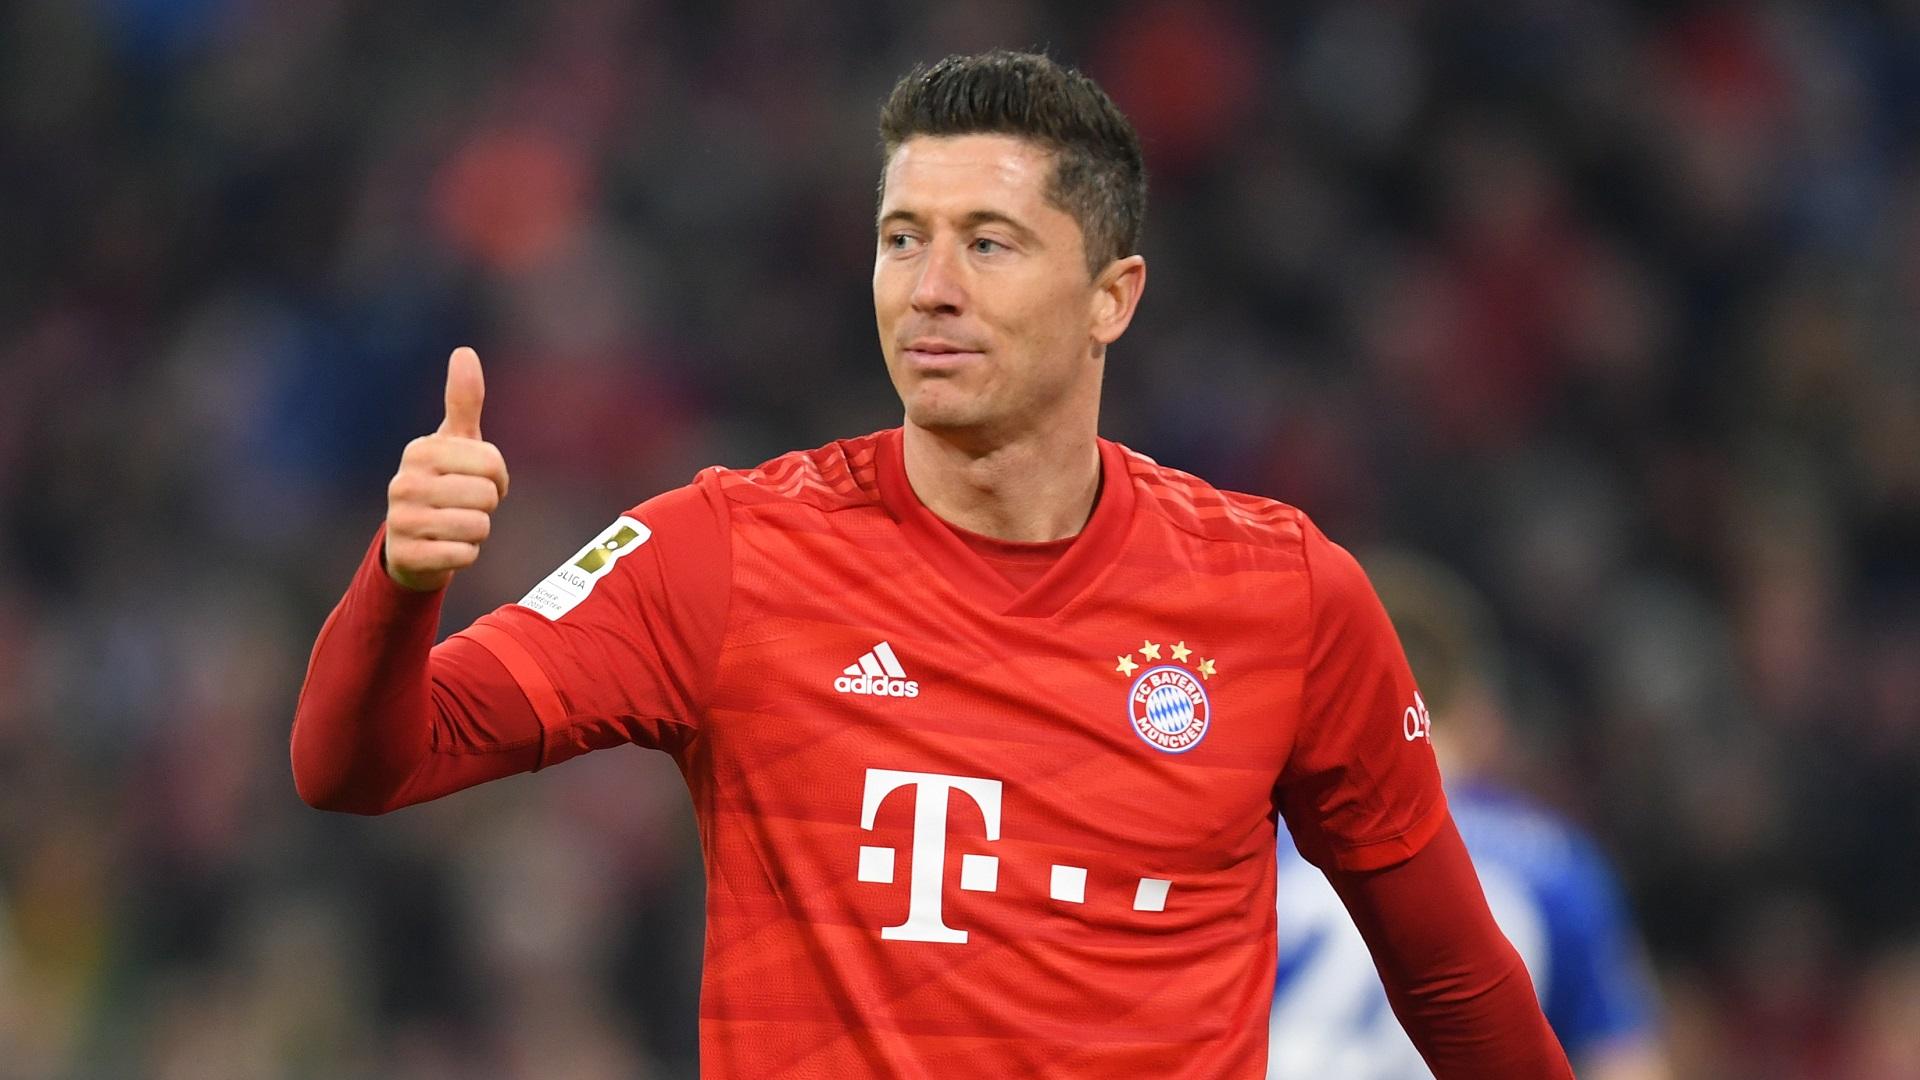 Robert Lewandowski mencetak gol ke-44 musim ini, Bayer Leverkusen 2-4 Bayern Munich